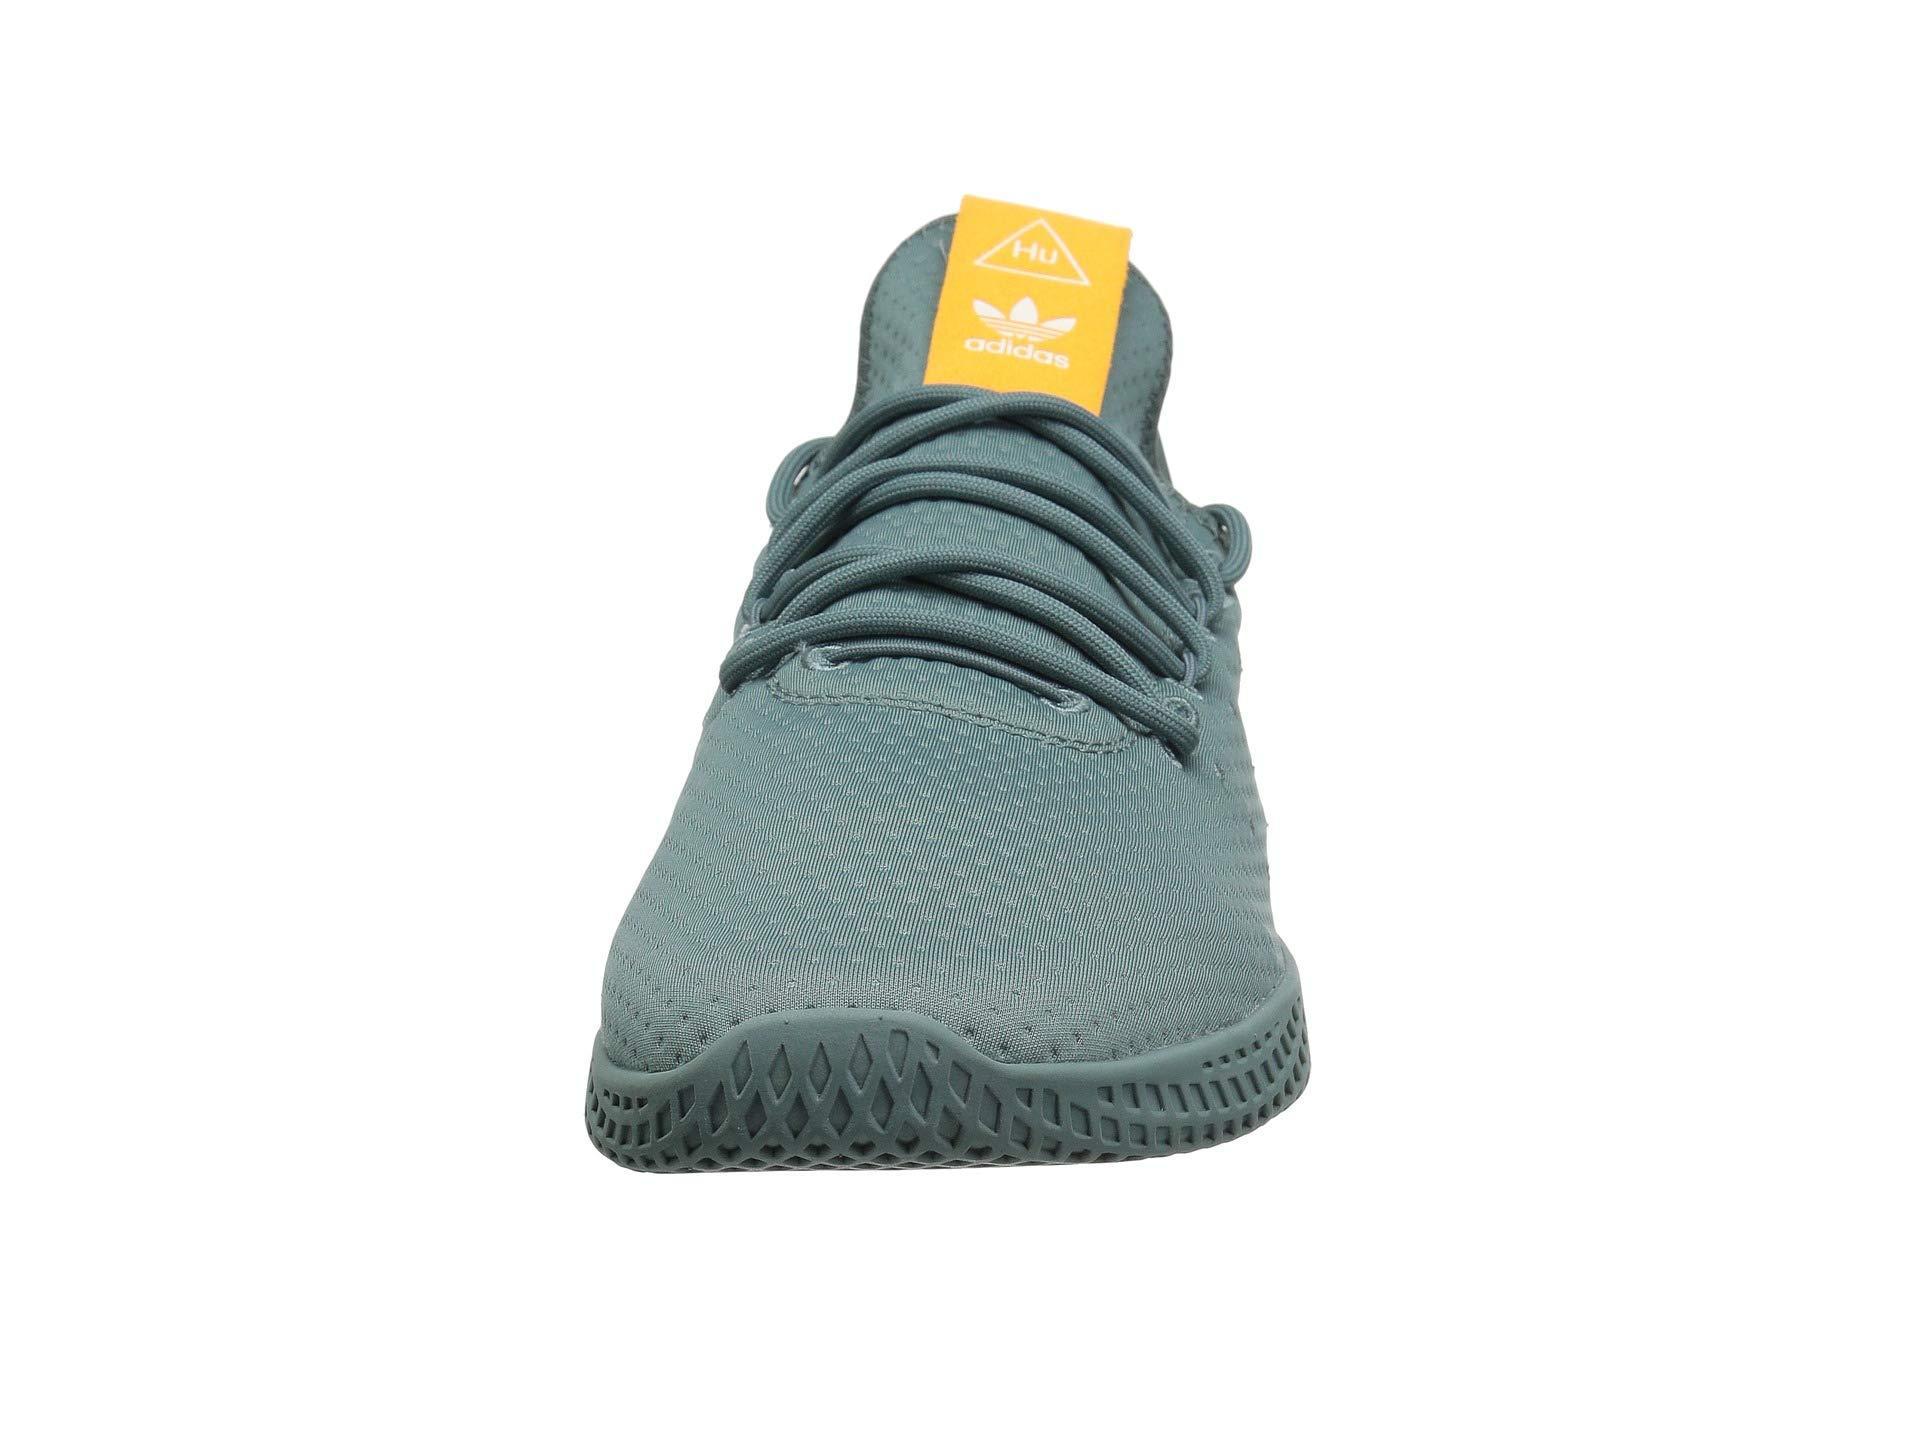 adidas Originals adidas Originals Pharrell Williams Tennis Human Race (Trace KhakiTrace KhakiChalk White) Men's Shoes from 6pm   People